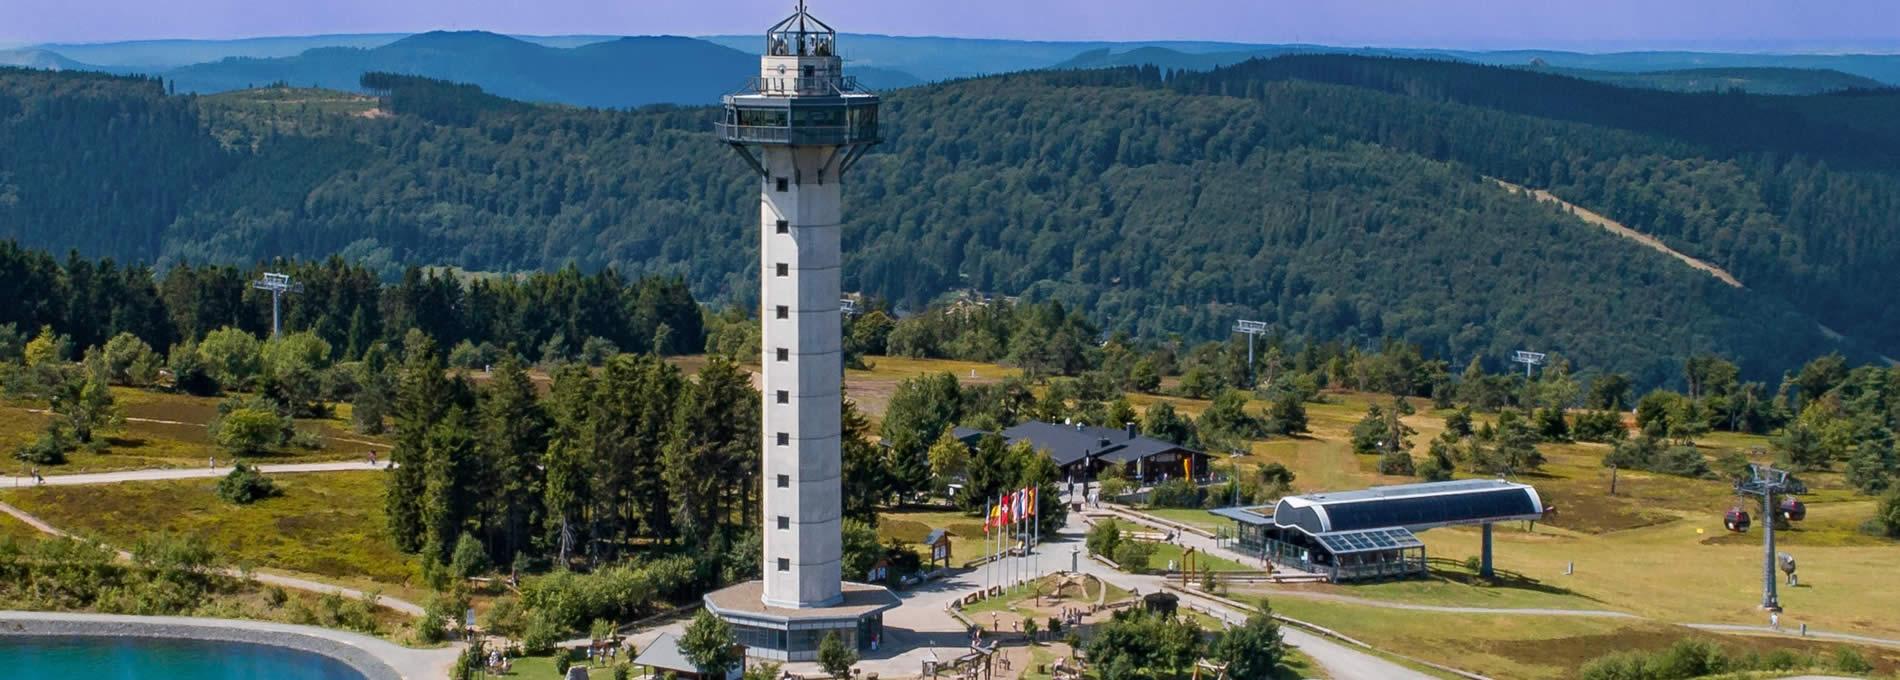 Slider Hochheideturm Bergstation